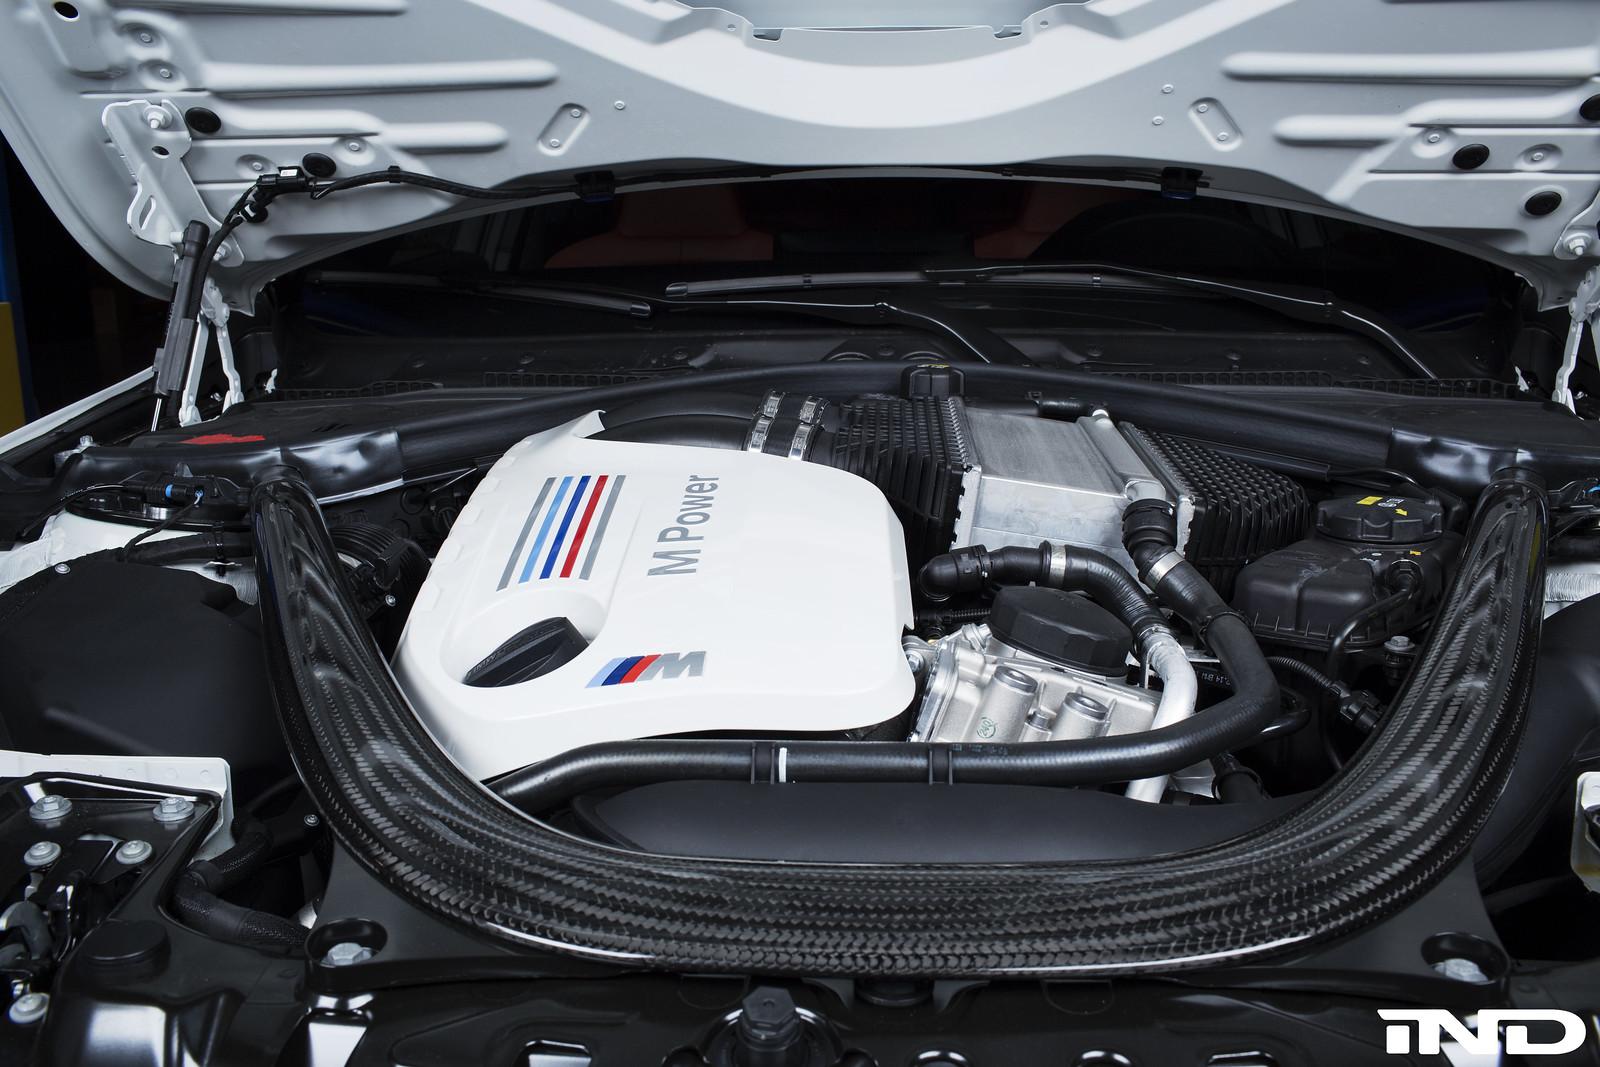 Bmw Bel Air Md Vwvortex Com Sedans Without A Rear Bench